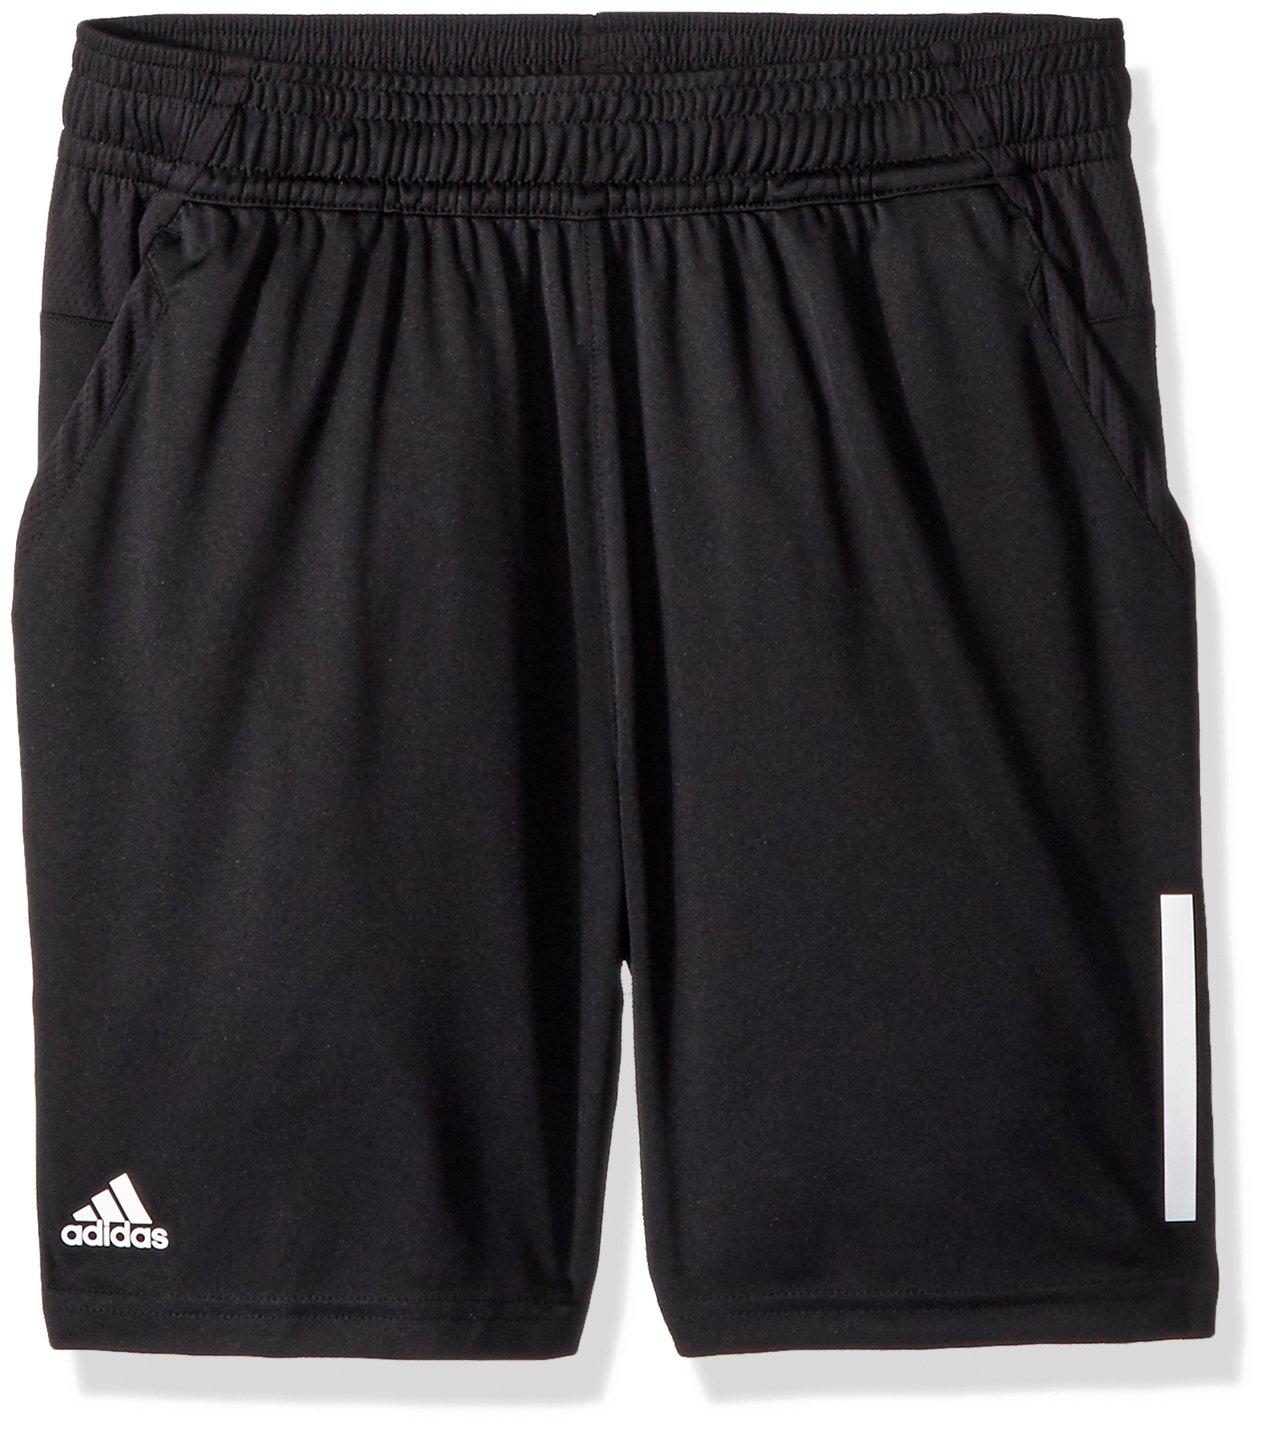 adidas Youth Boys Tennis 3-Stripes Club Shorts, Black, X-Large